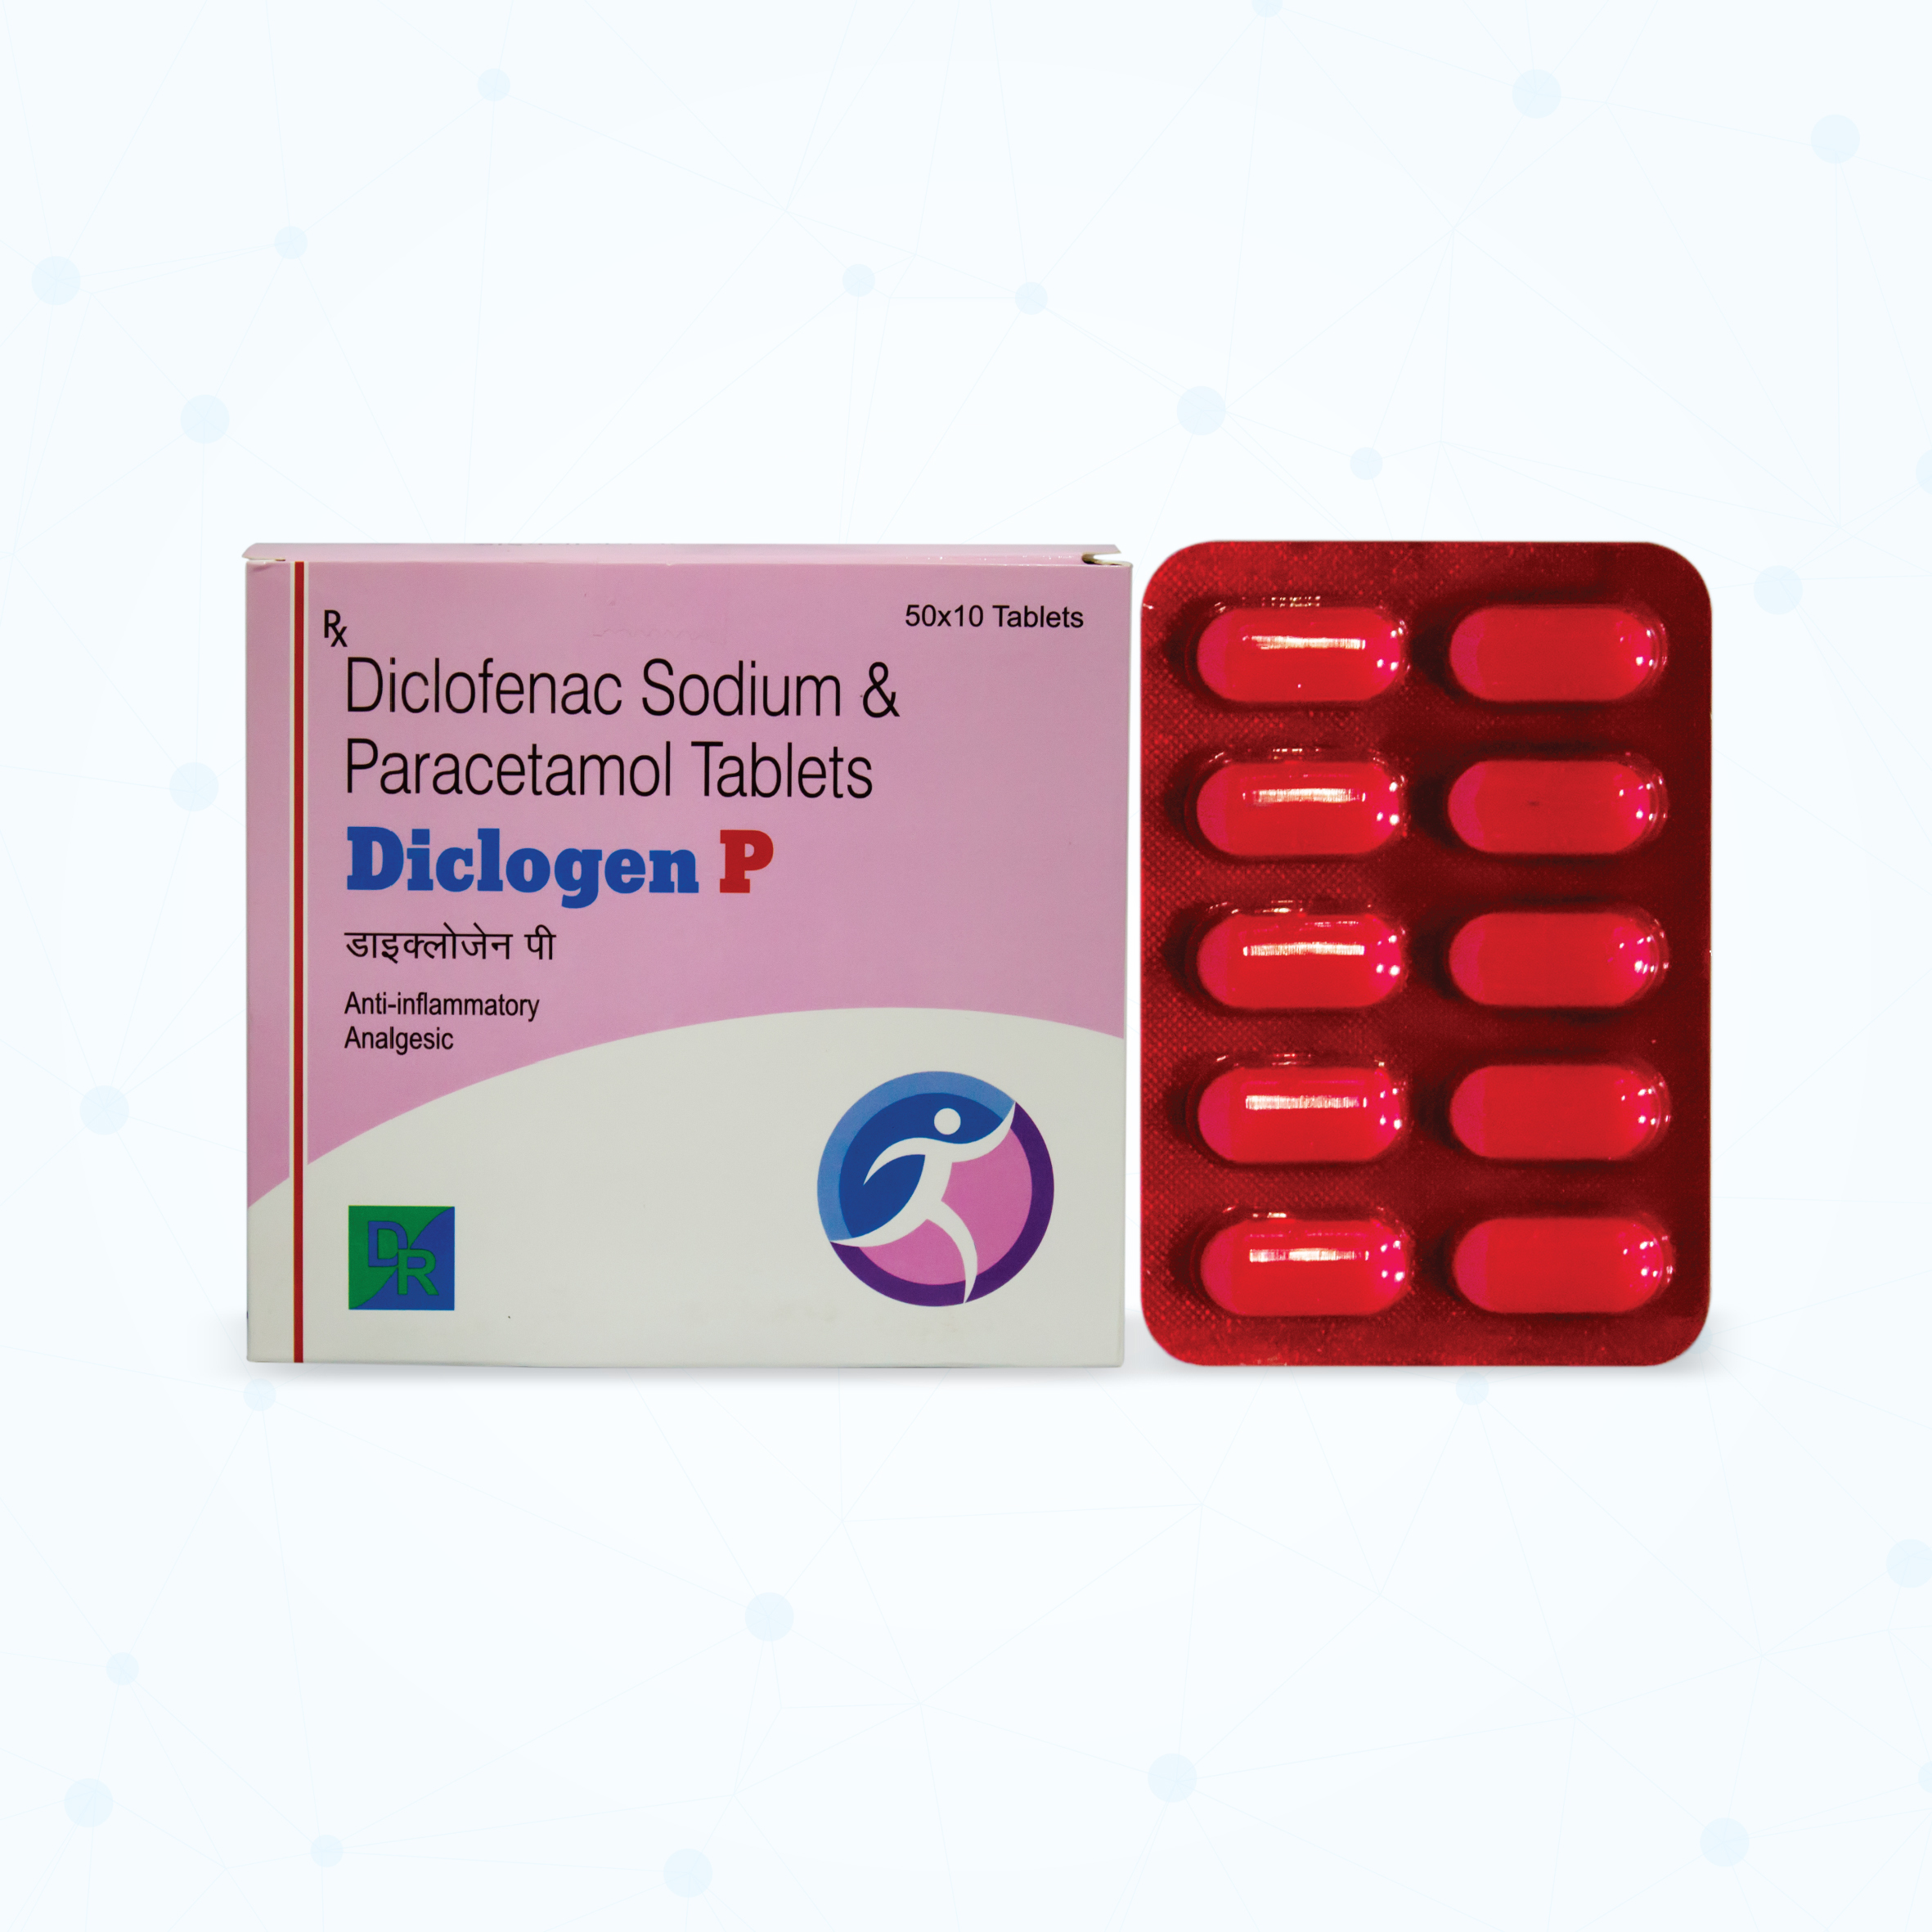 DICLOFENAC SODIUM TABLETS